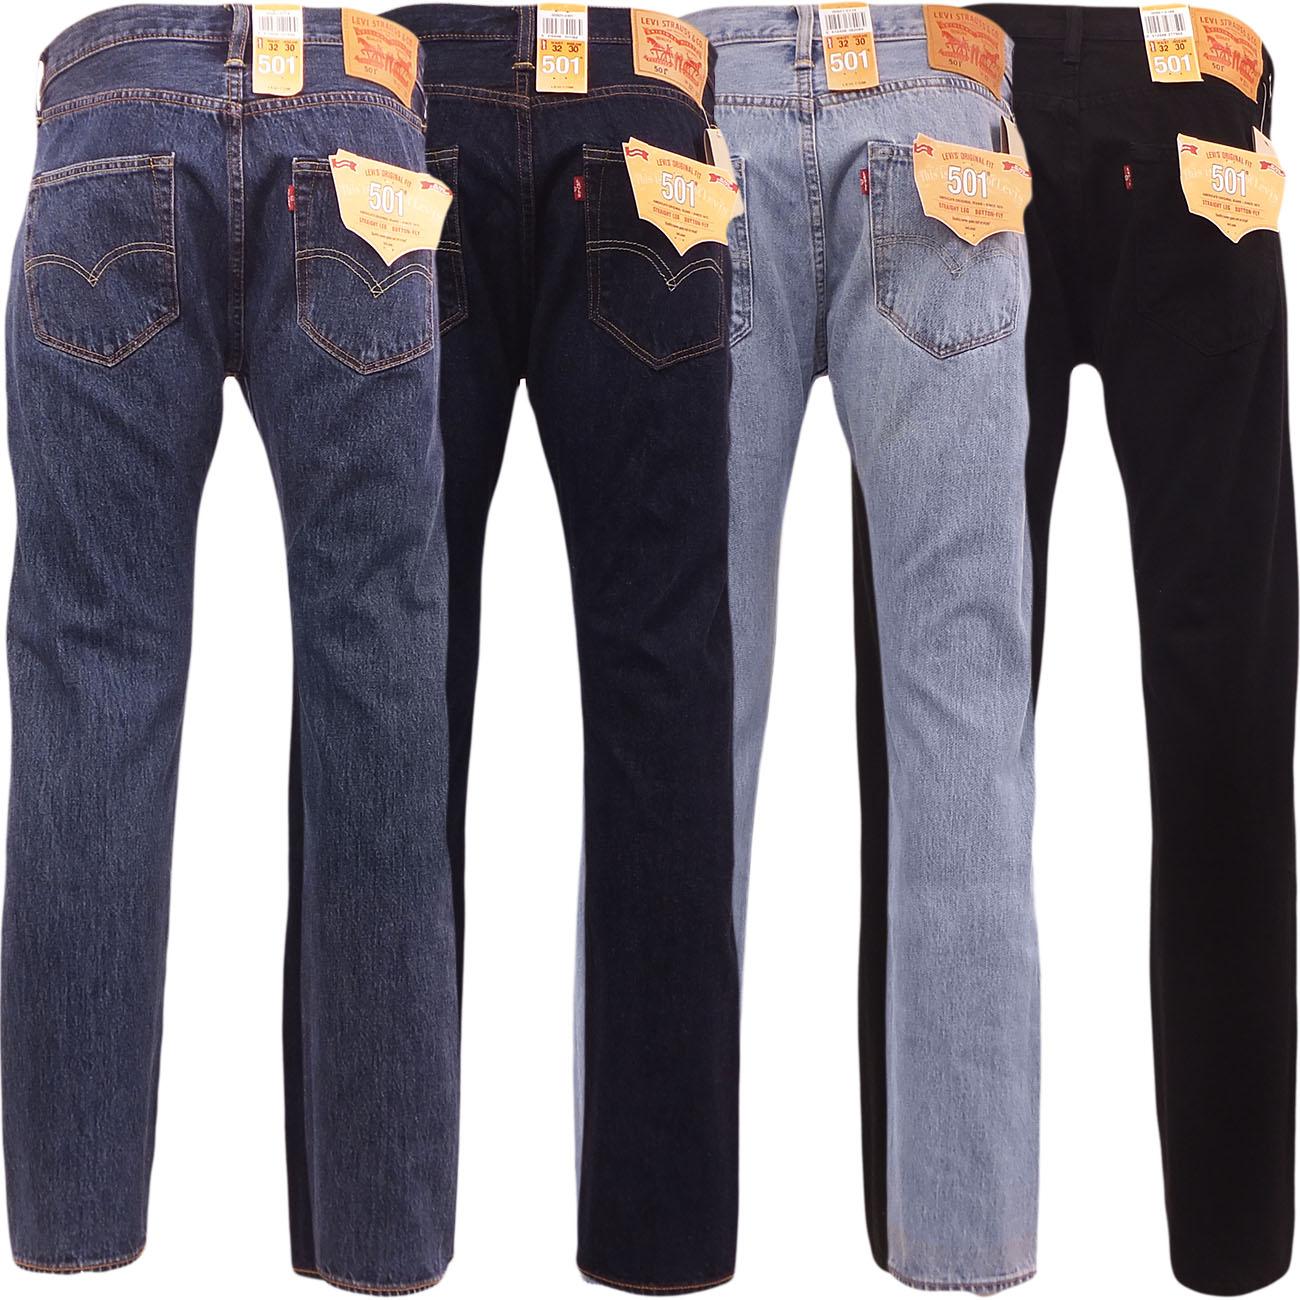 b8a9956d93f Levi 501 Jeans para Hombre Levi s Strauss Calce Recto trouser pant ...